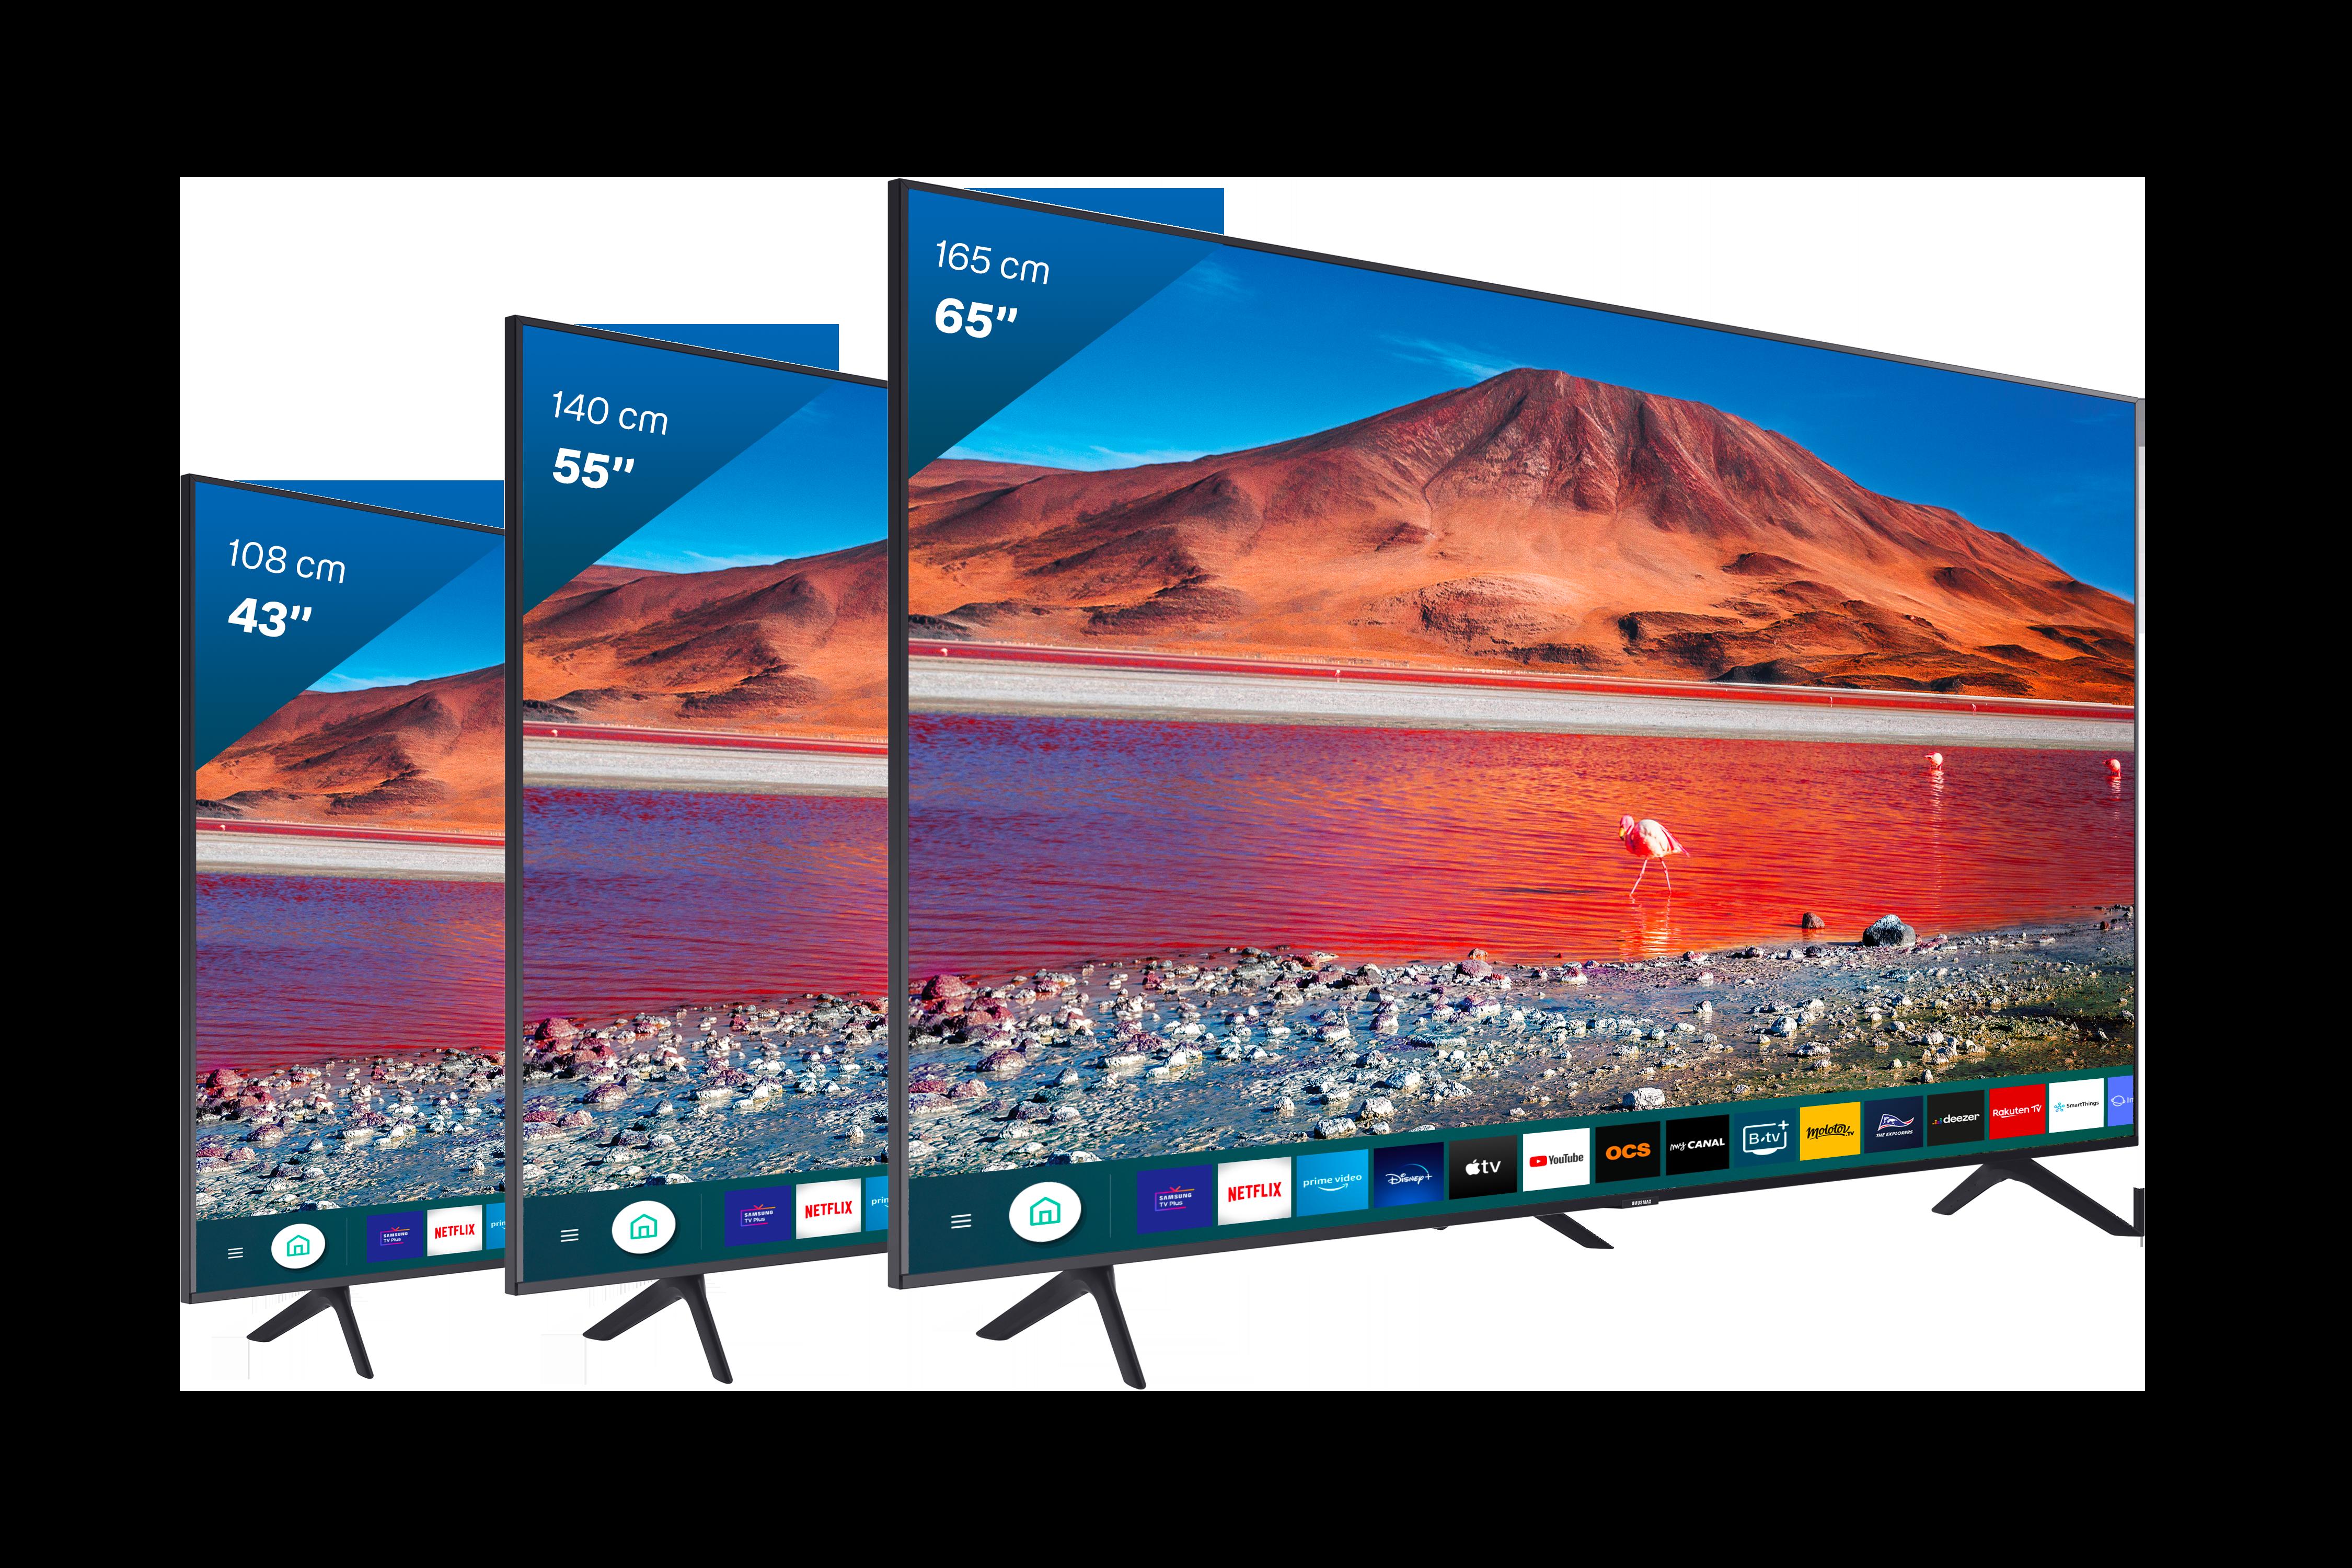 Gamme Télévisions Samsung - Bbox Smart TV - Applications